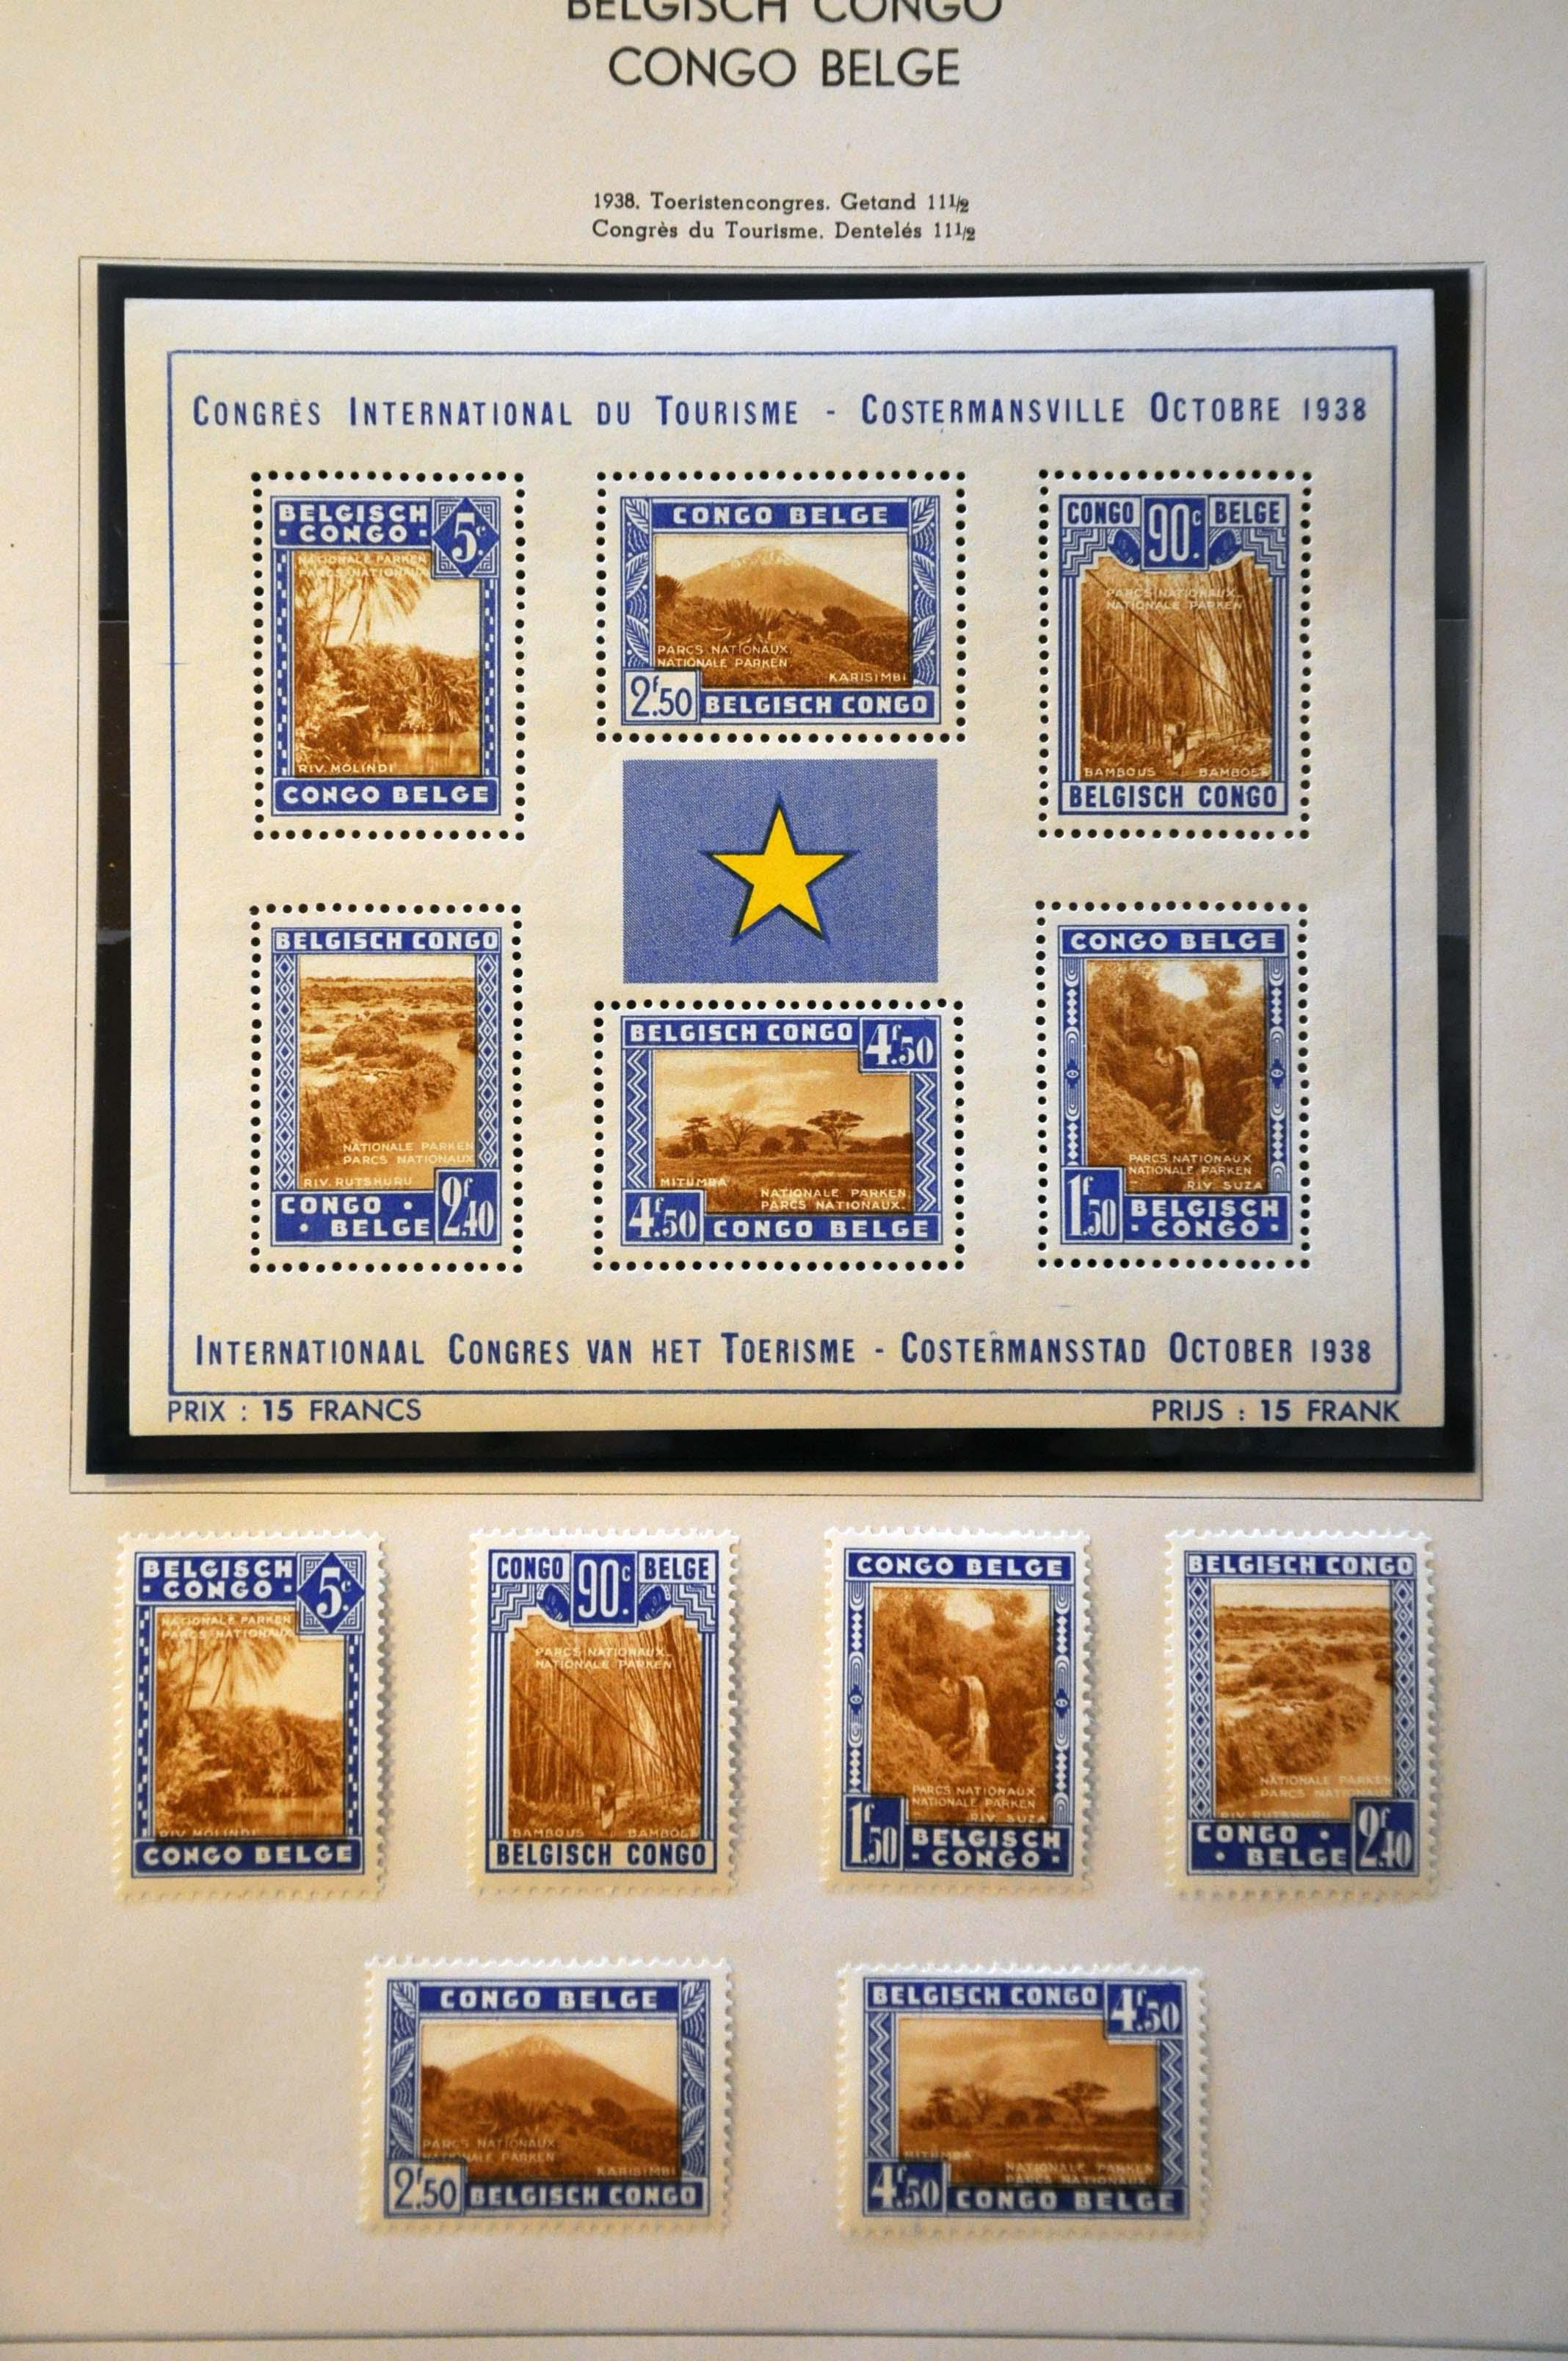 Lot 594 - Belgium and former colonies belgian congo -  Corinphila Veilingen Auction 245-246 Day 2 - Foreign countries - Collections and lots, Foreign countries - Boxes and literature